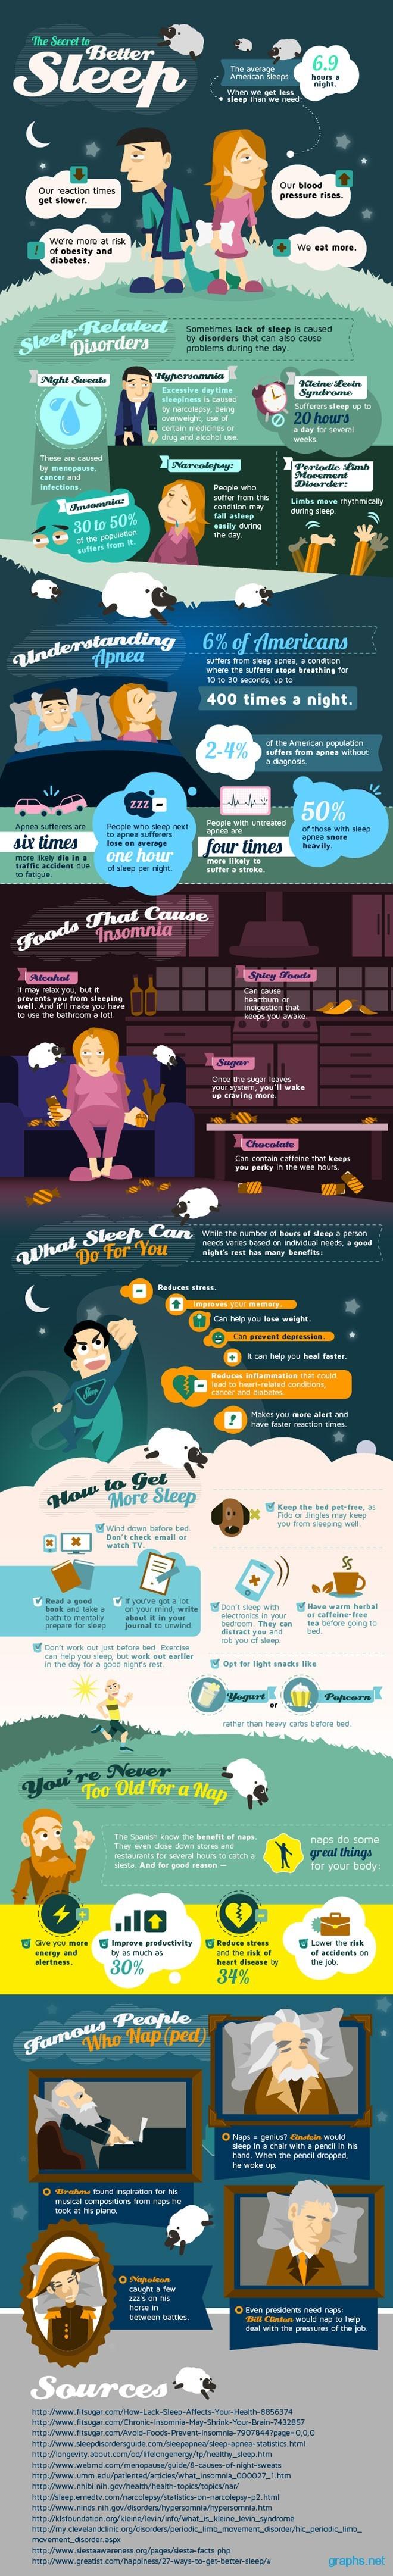 secrets to better sleep